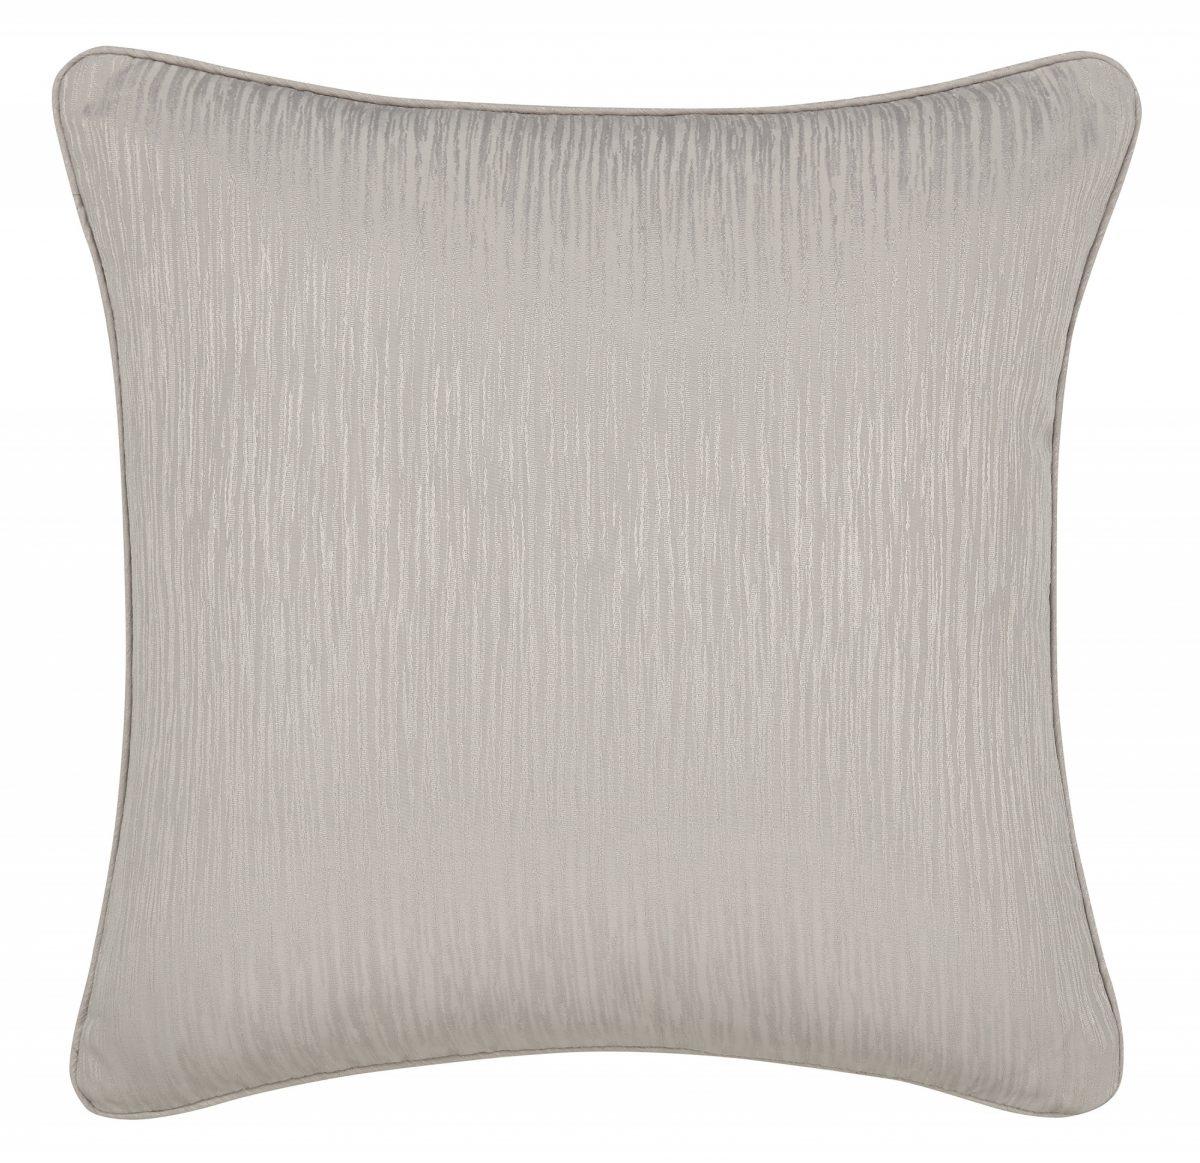 Pb Hotel Barcelo Cashmere Cushion Co 1